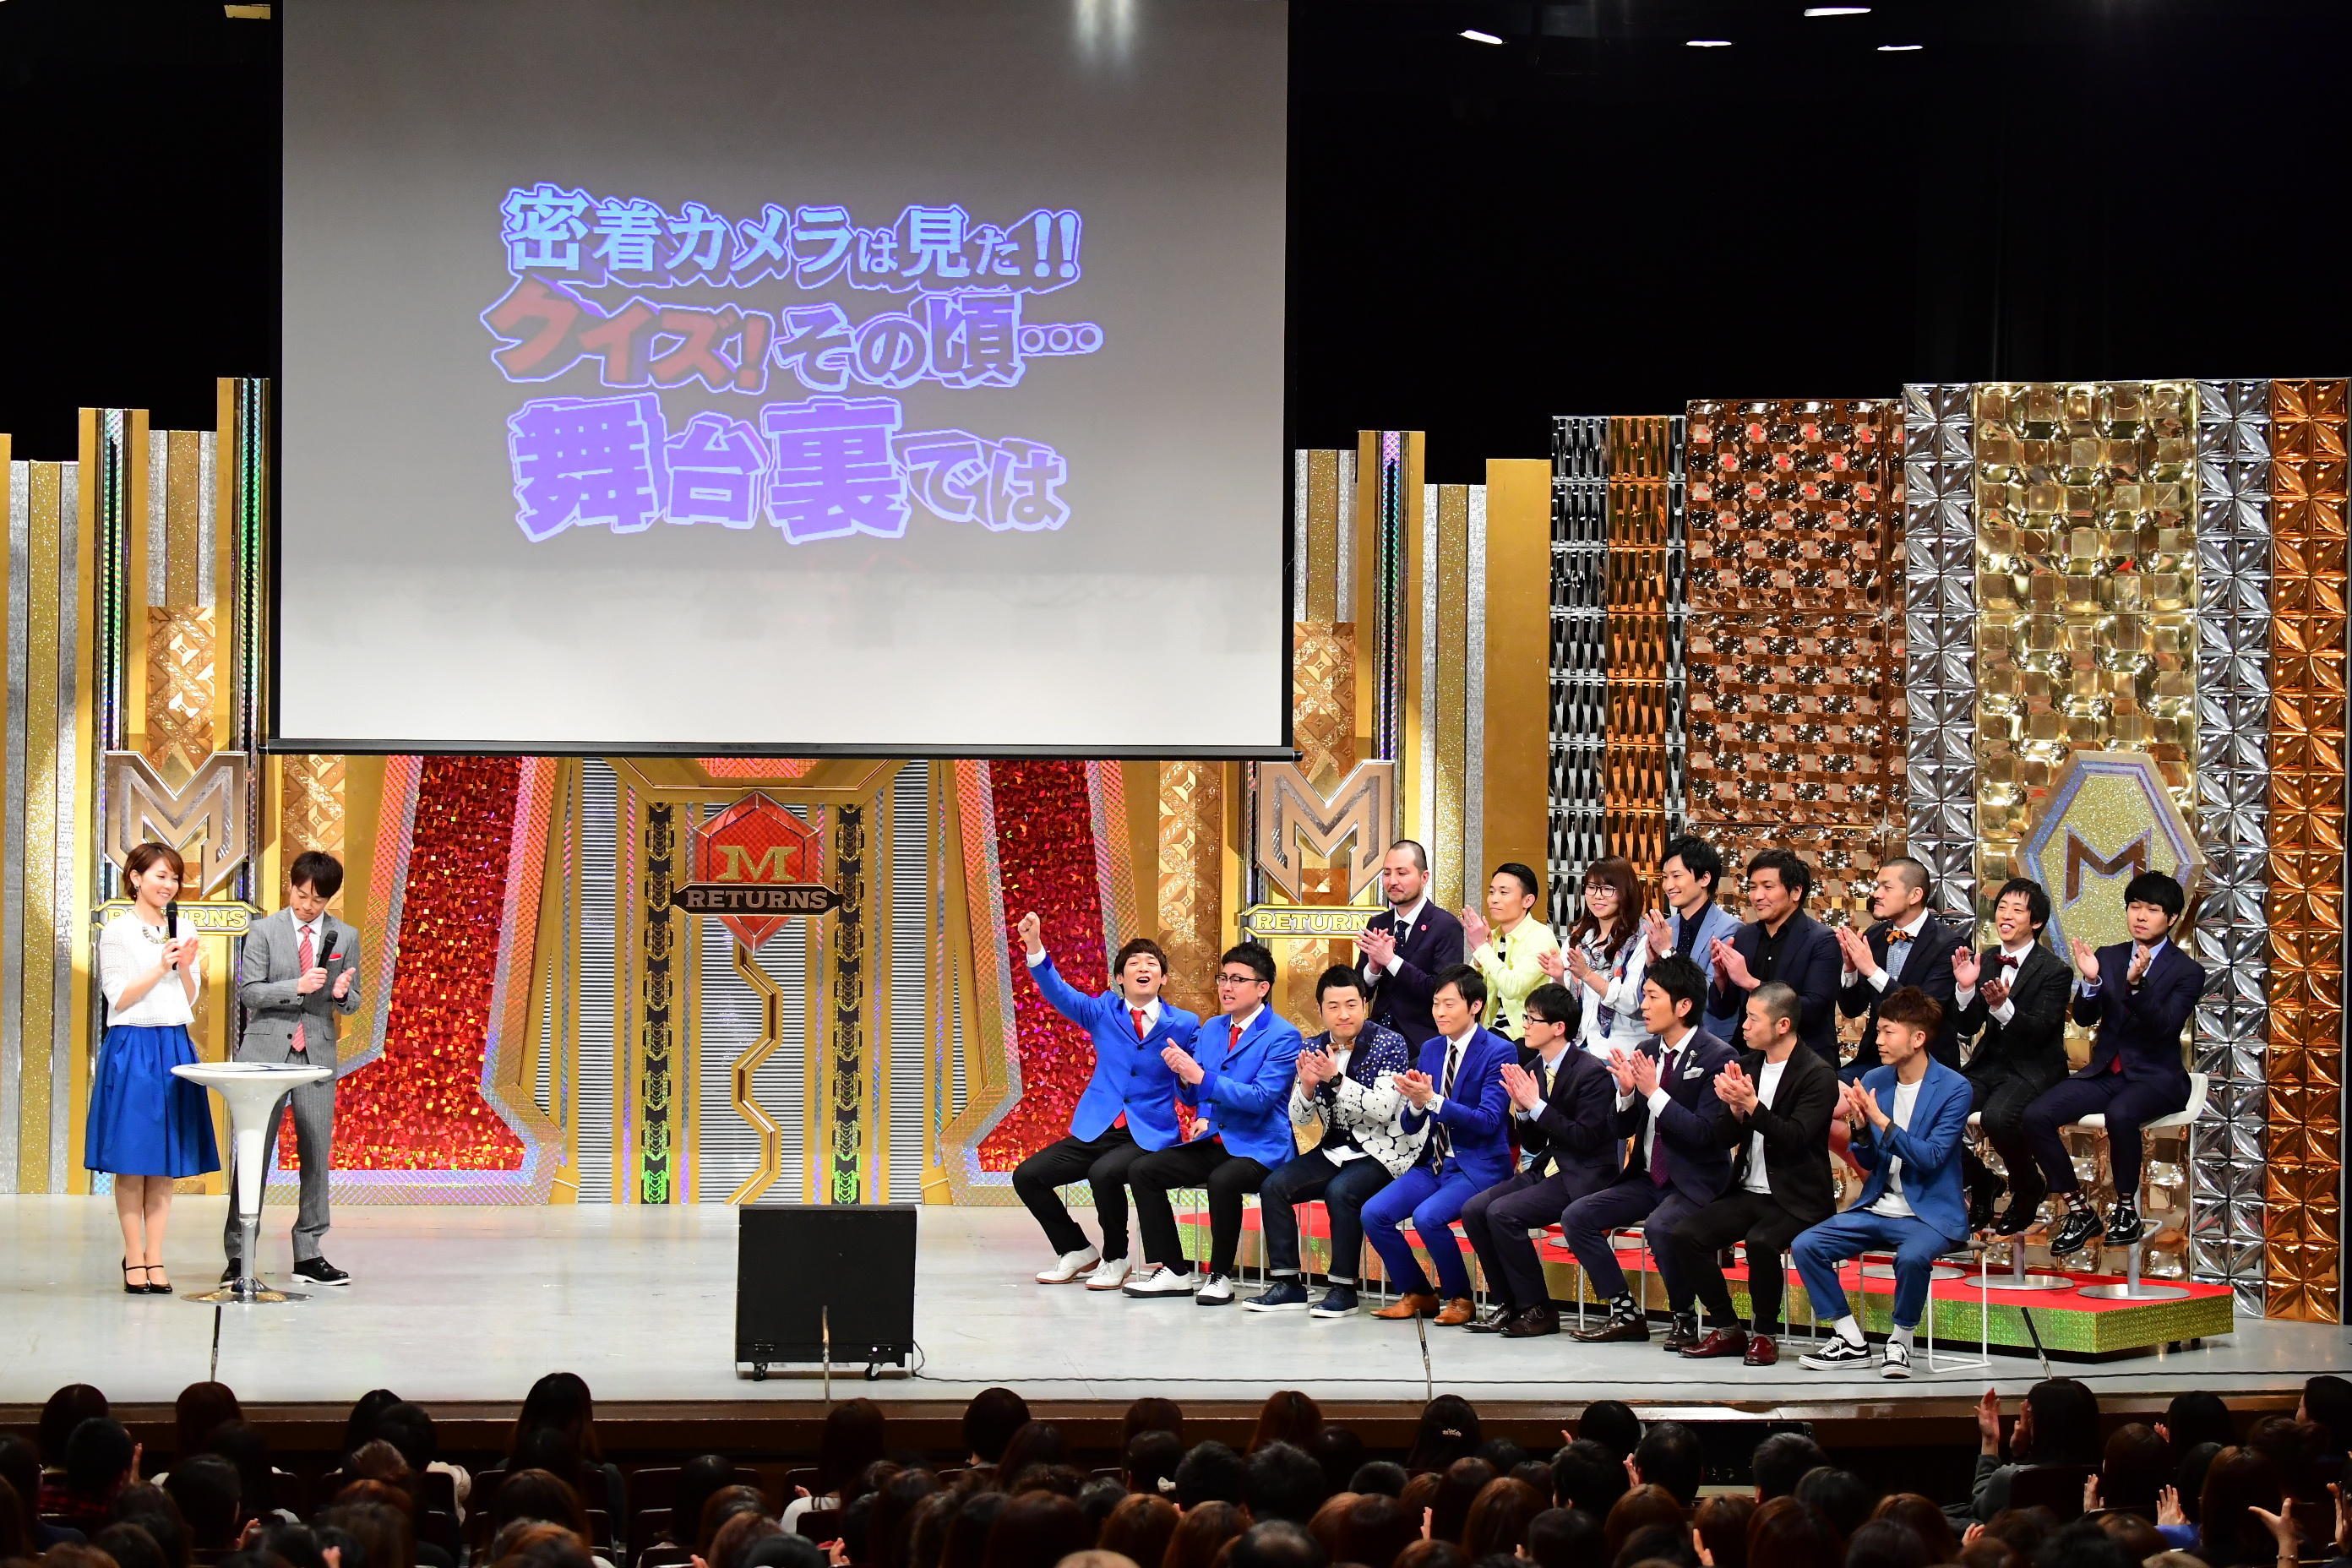 http://news.yoshimoto.co.jp/20170228155800-e58084af9a8b8d72dc91aceedd77149c39f28d98.jpg